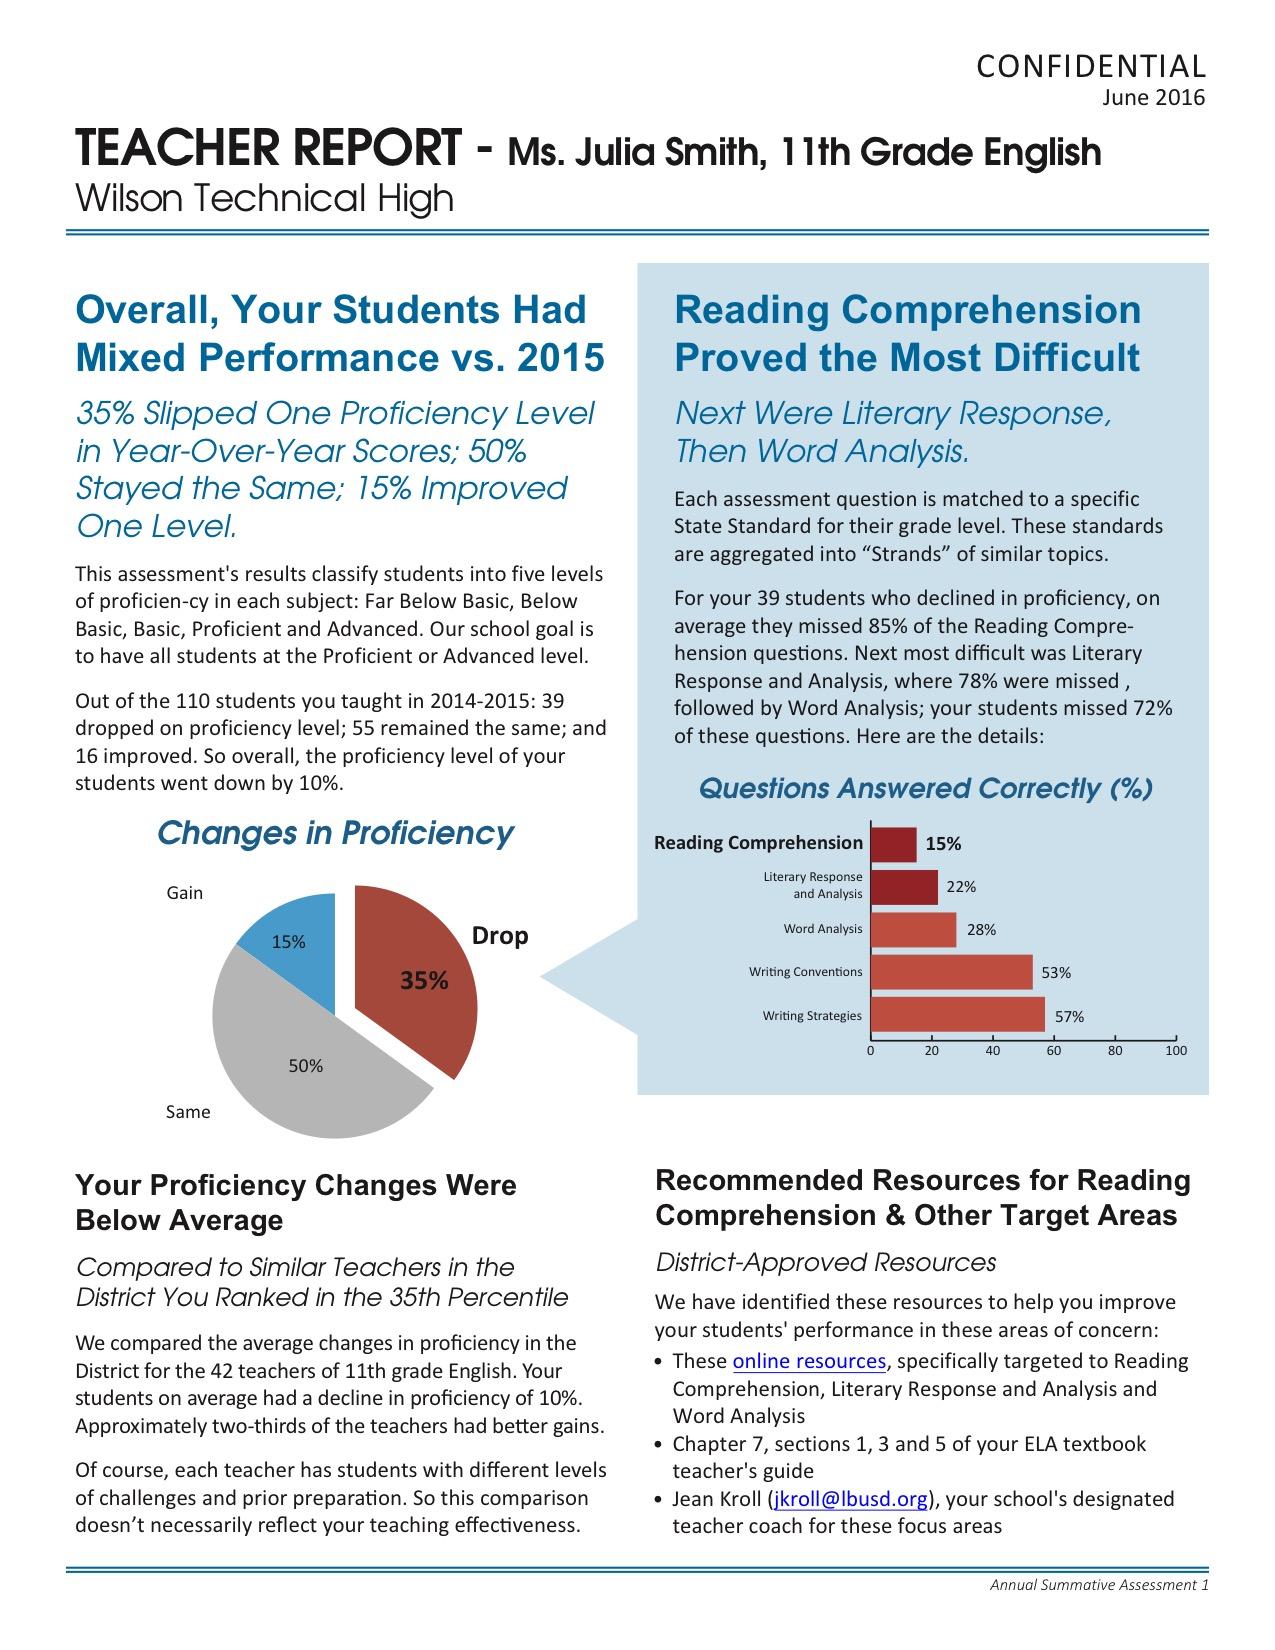 Teacher Standardized Test Report.jpg